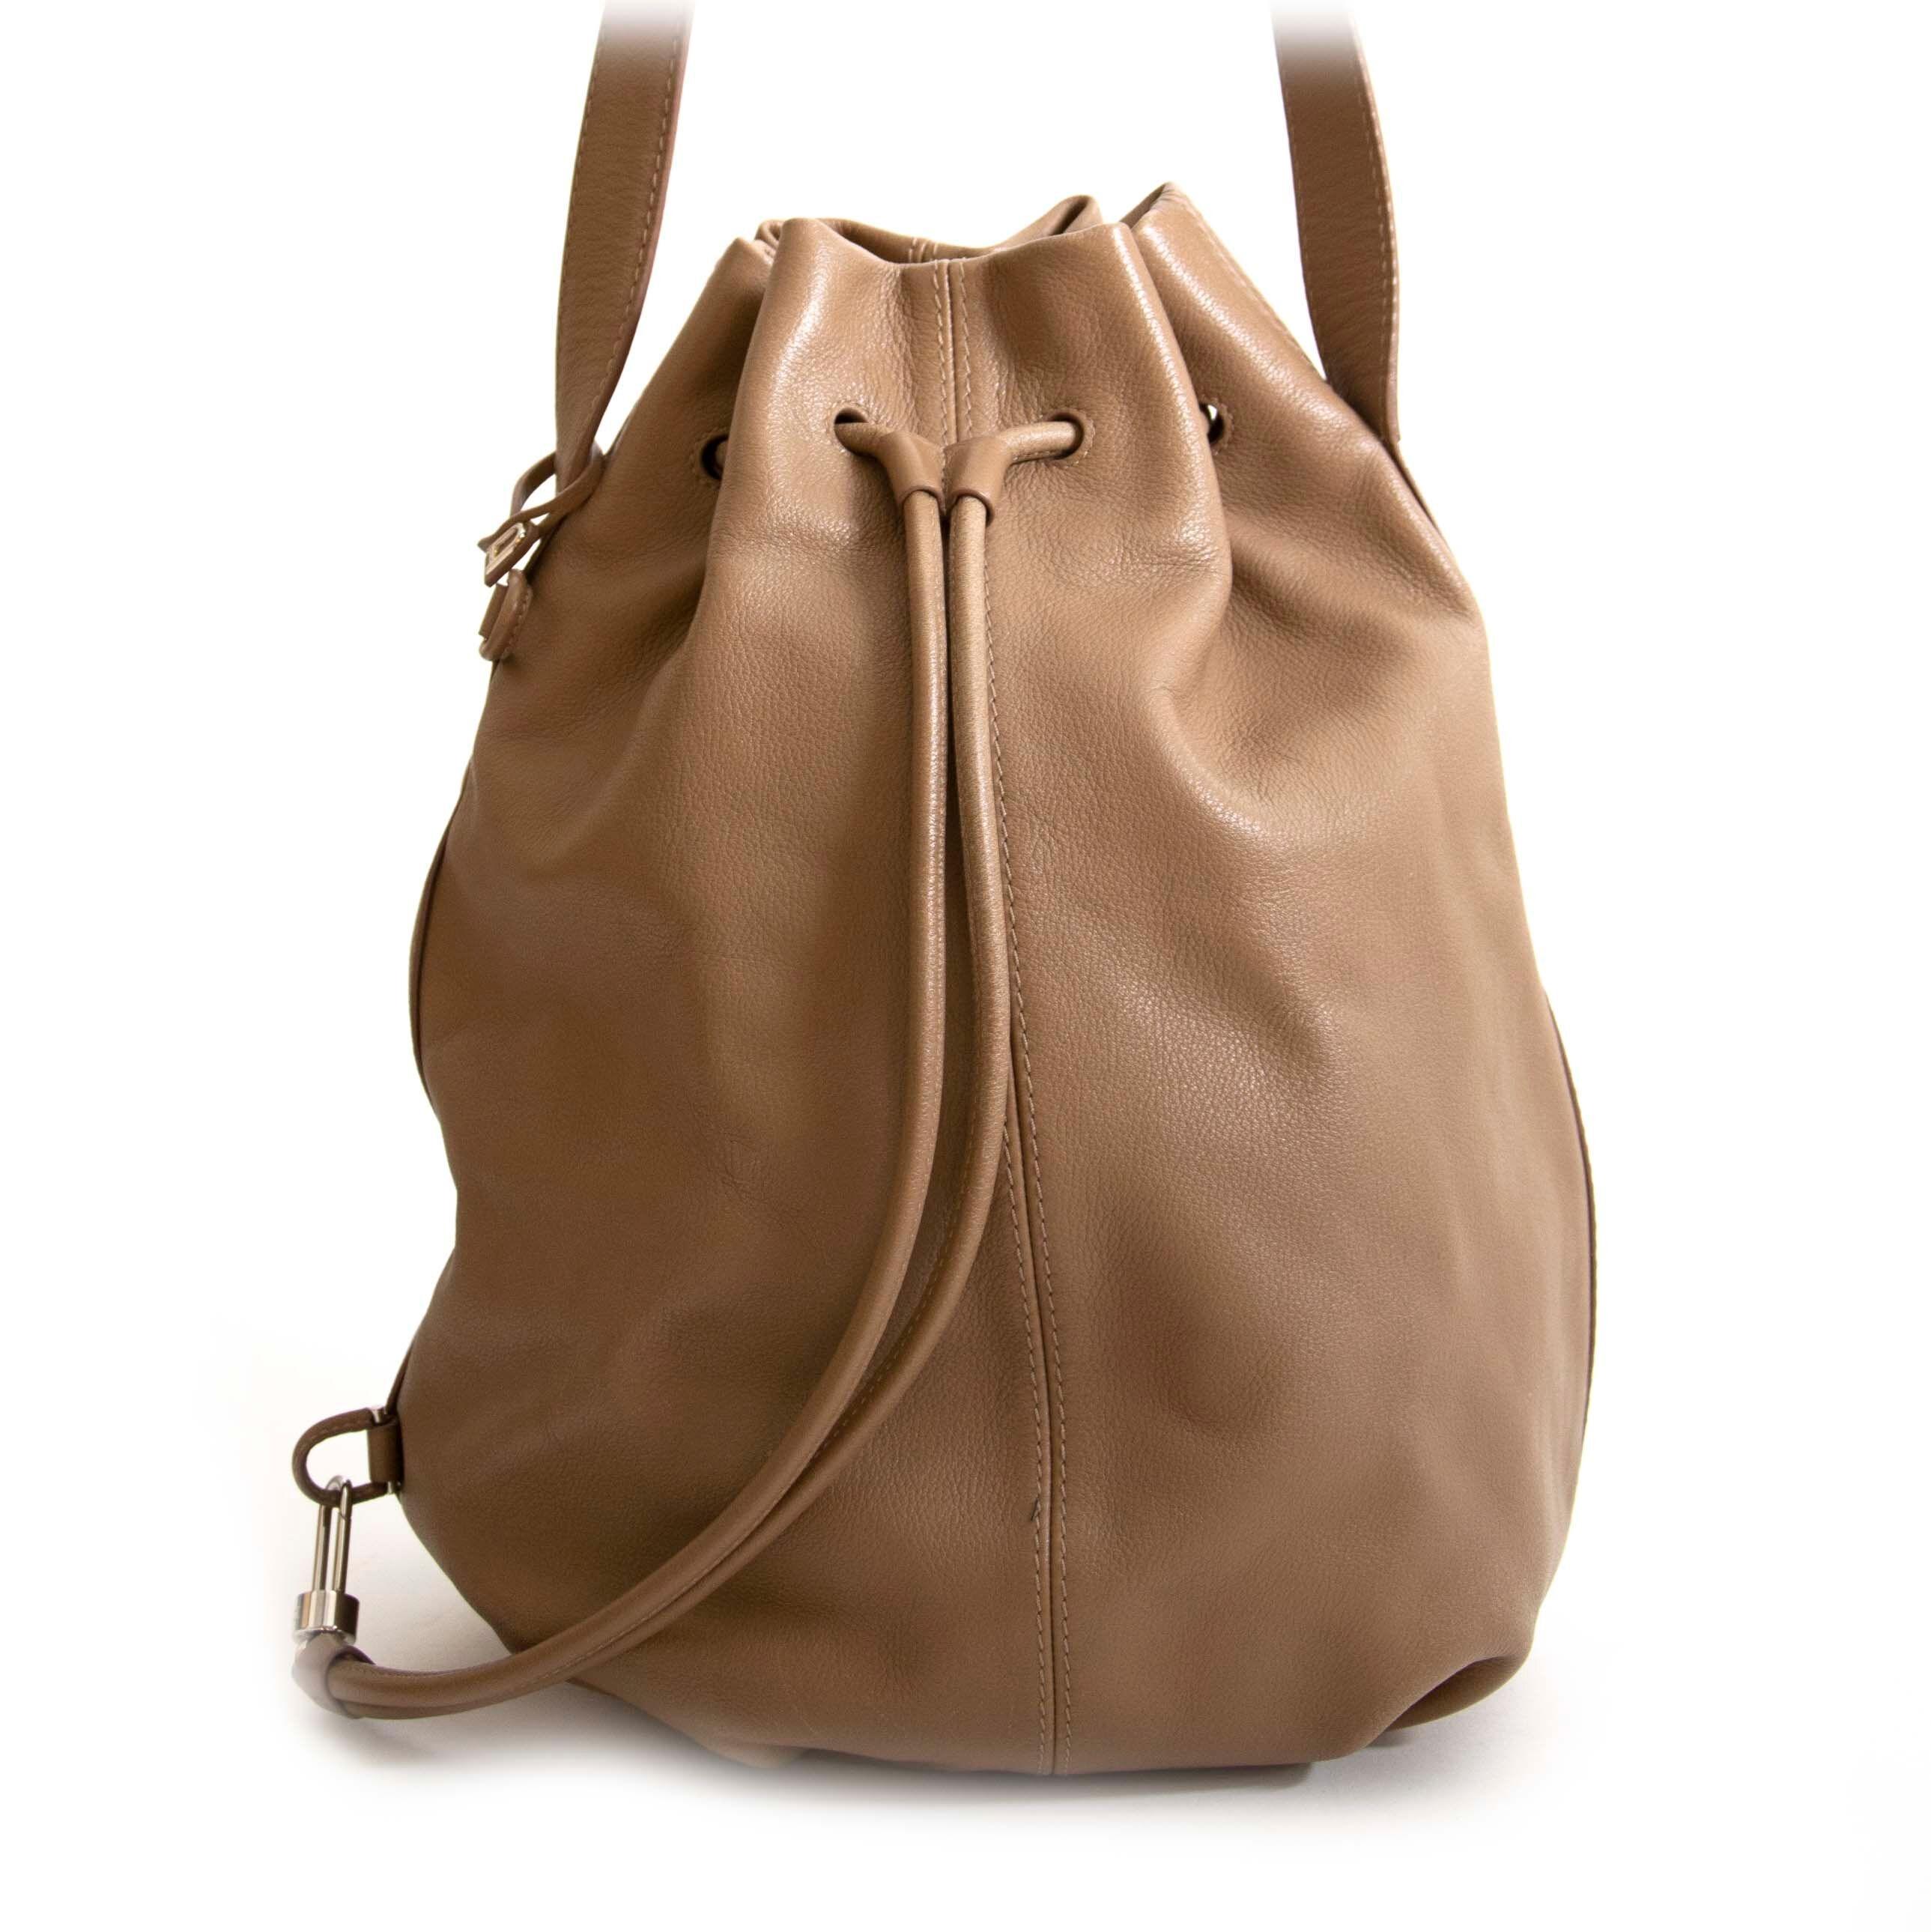 Koop authentieke tweedehands vintage Delvaux Nomade Sellier Bag bij online webshop LabelLOV.